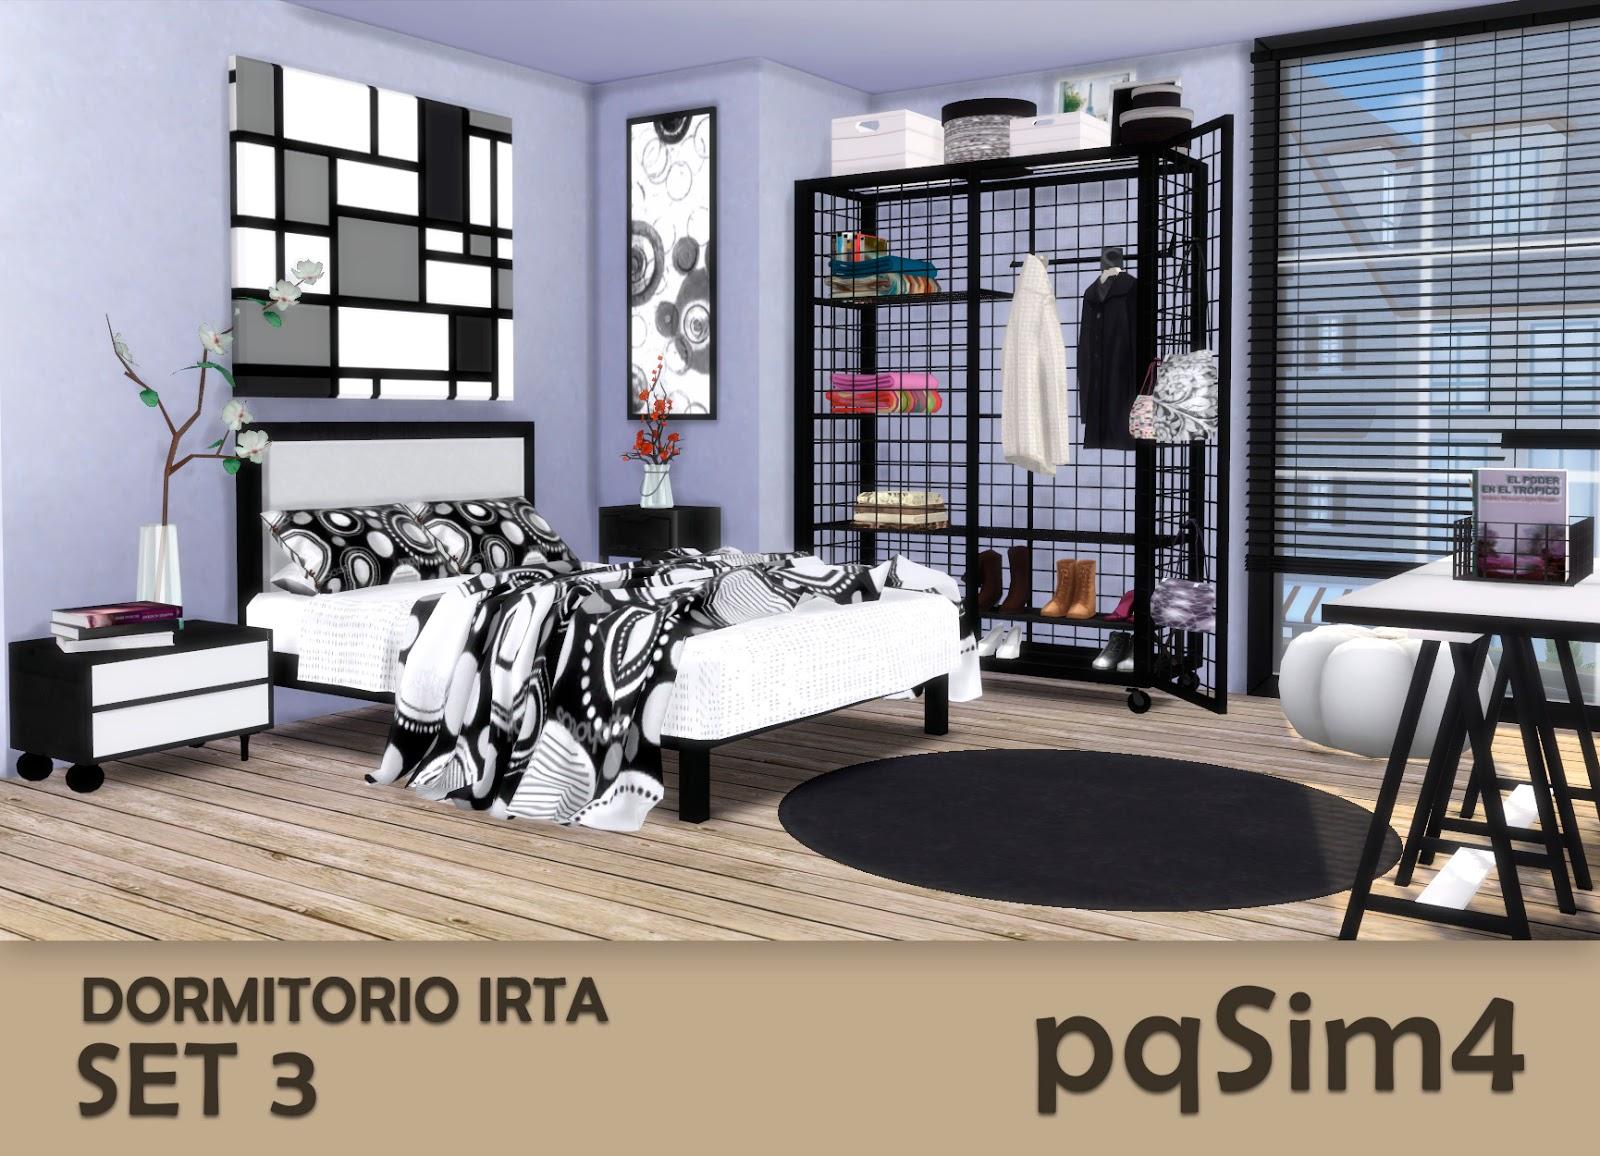 Irta bedroom set n 3 sims 4 custom content for Dormitorio sims 4